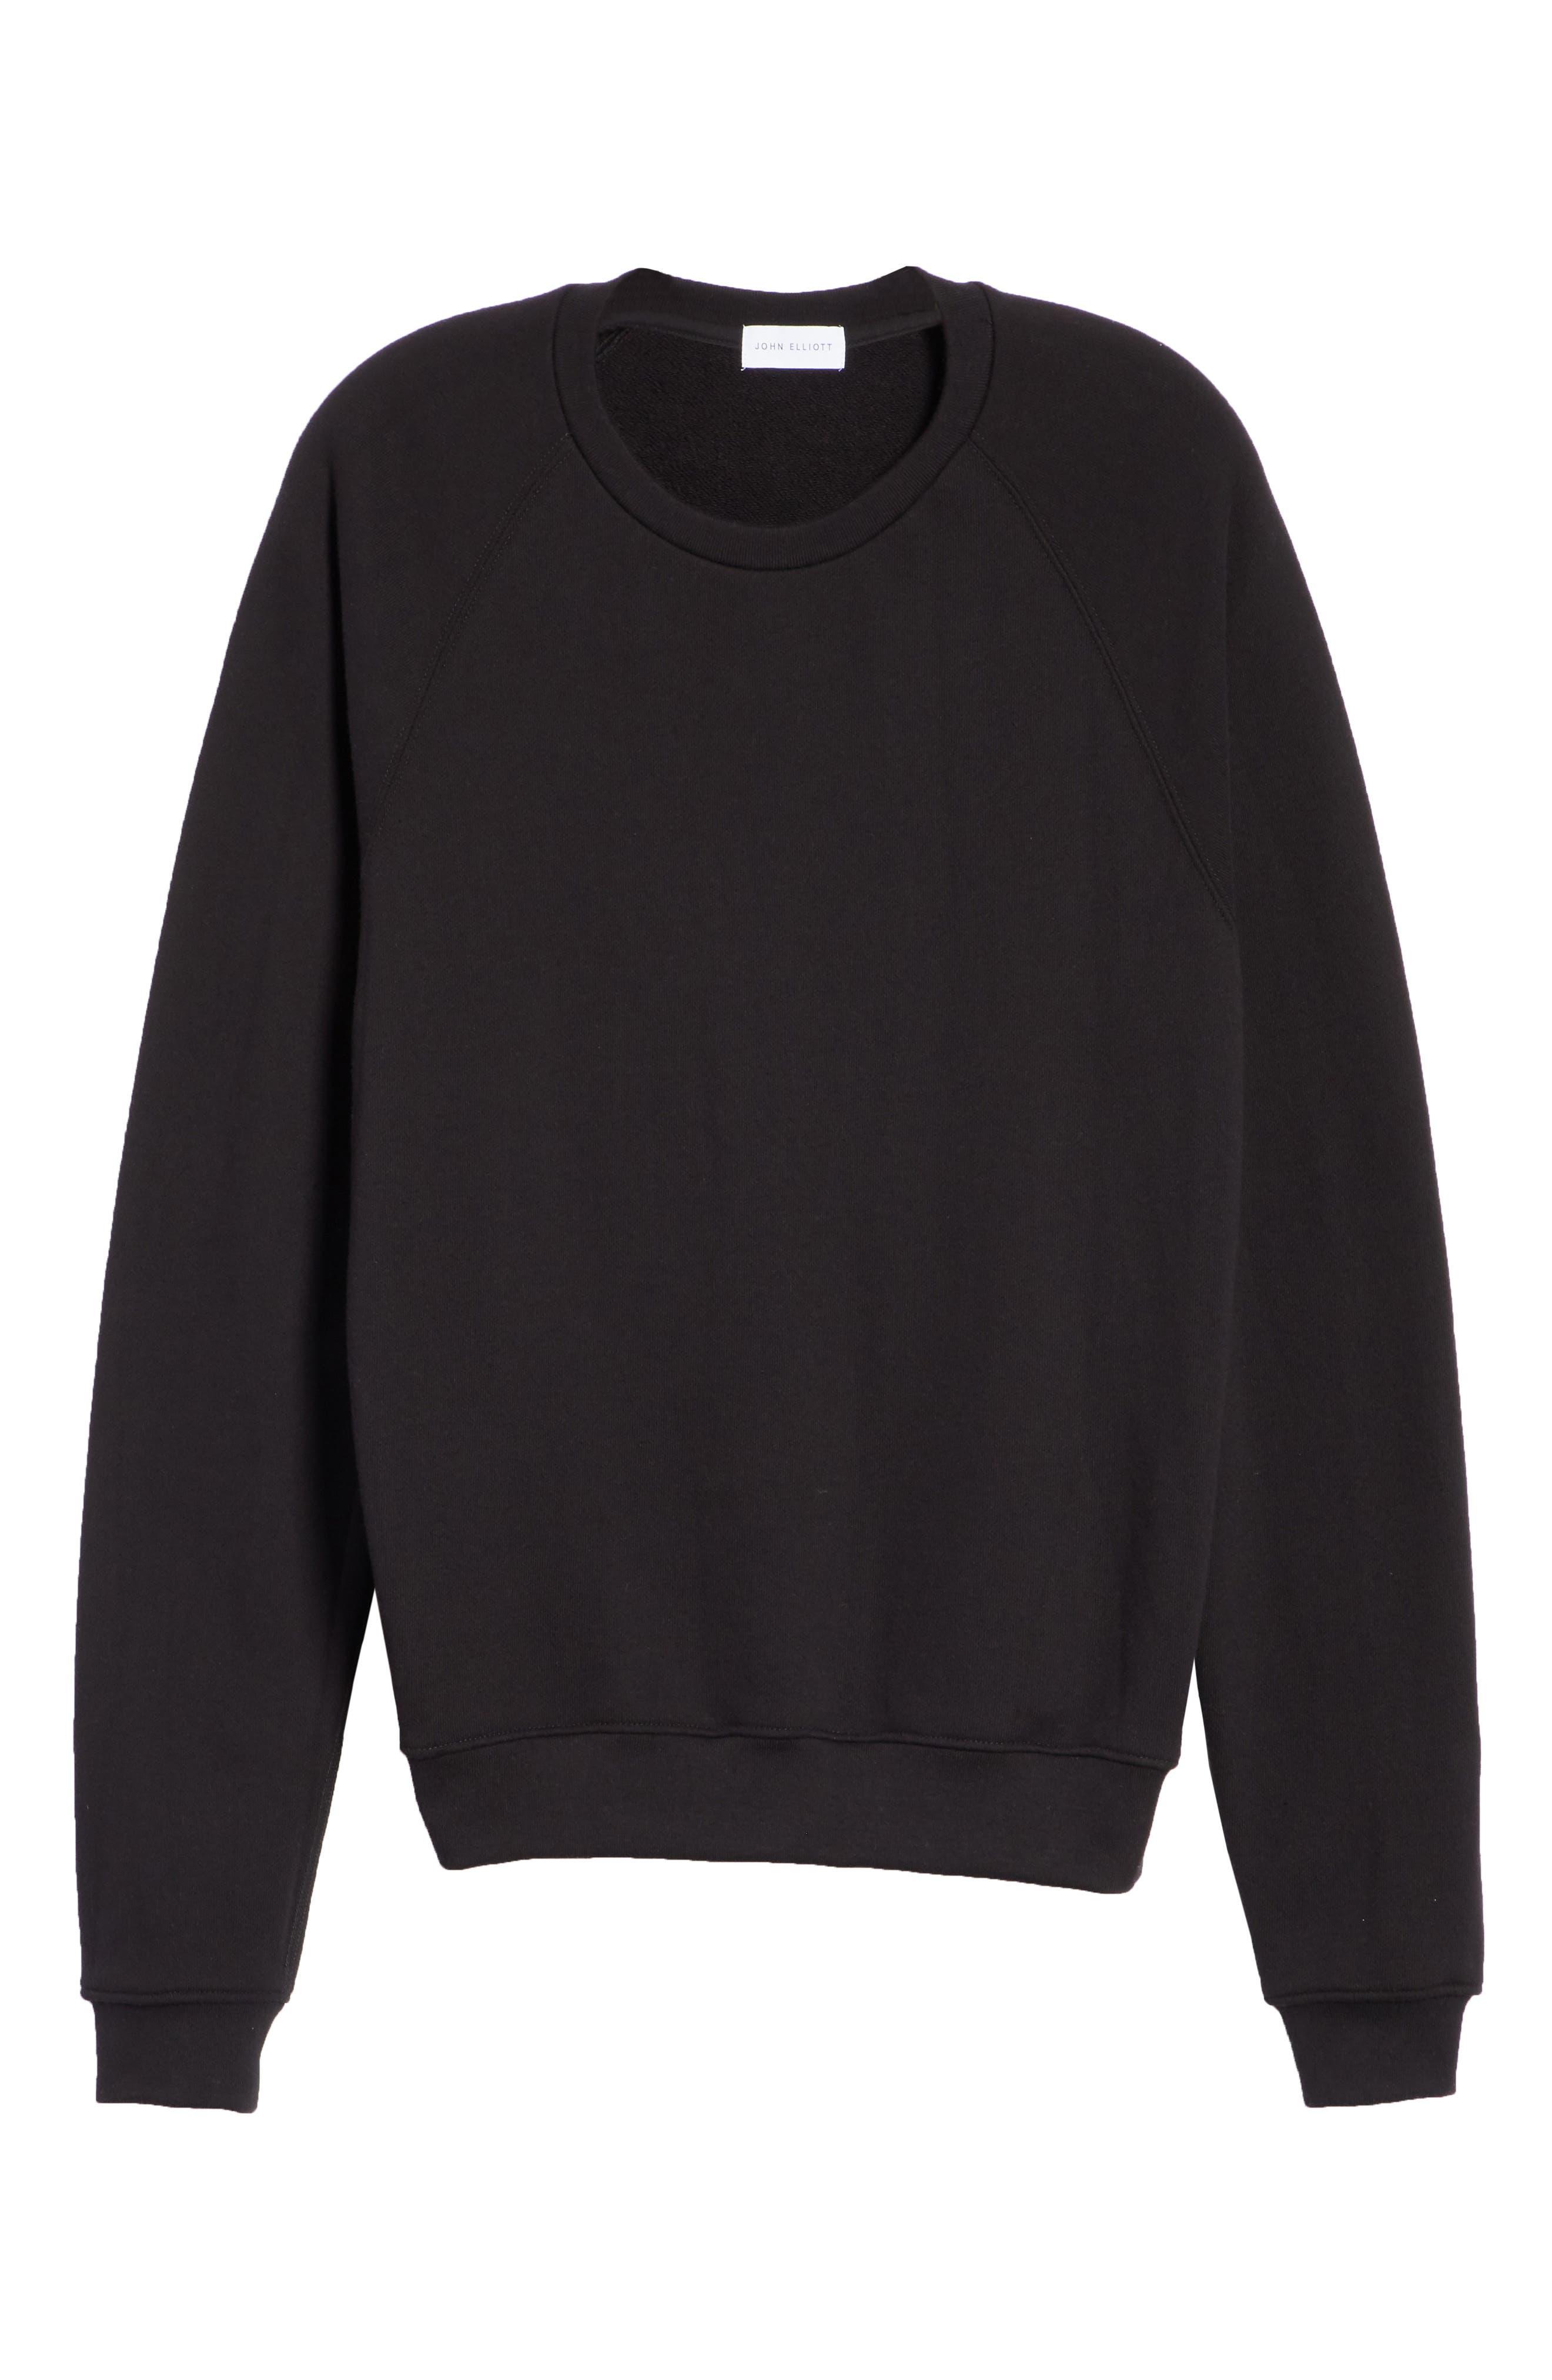 Raglan Crewneck Sweatshirt,                             Alternate thumbnail 6, color,                             BLACK